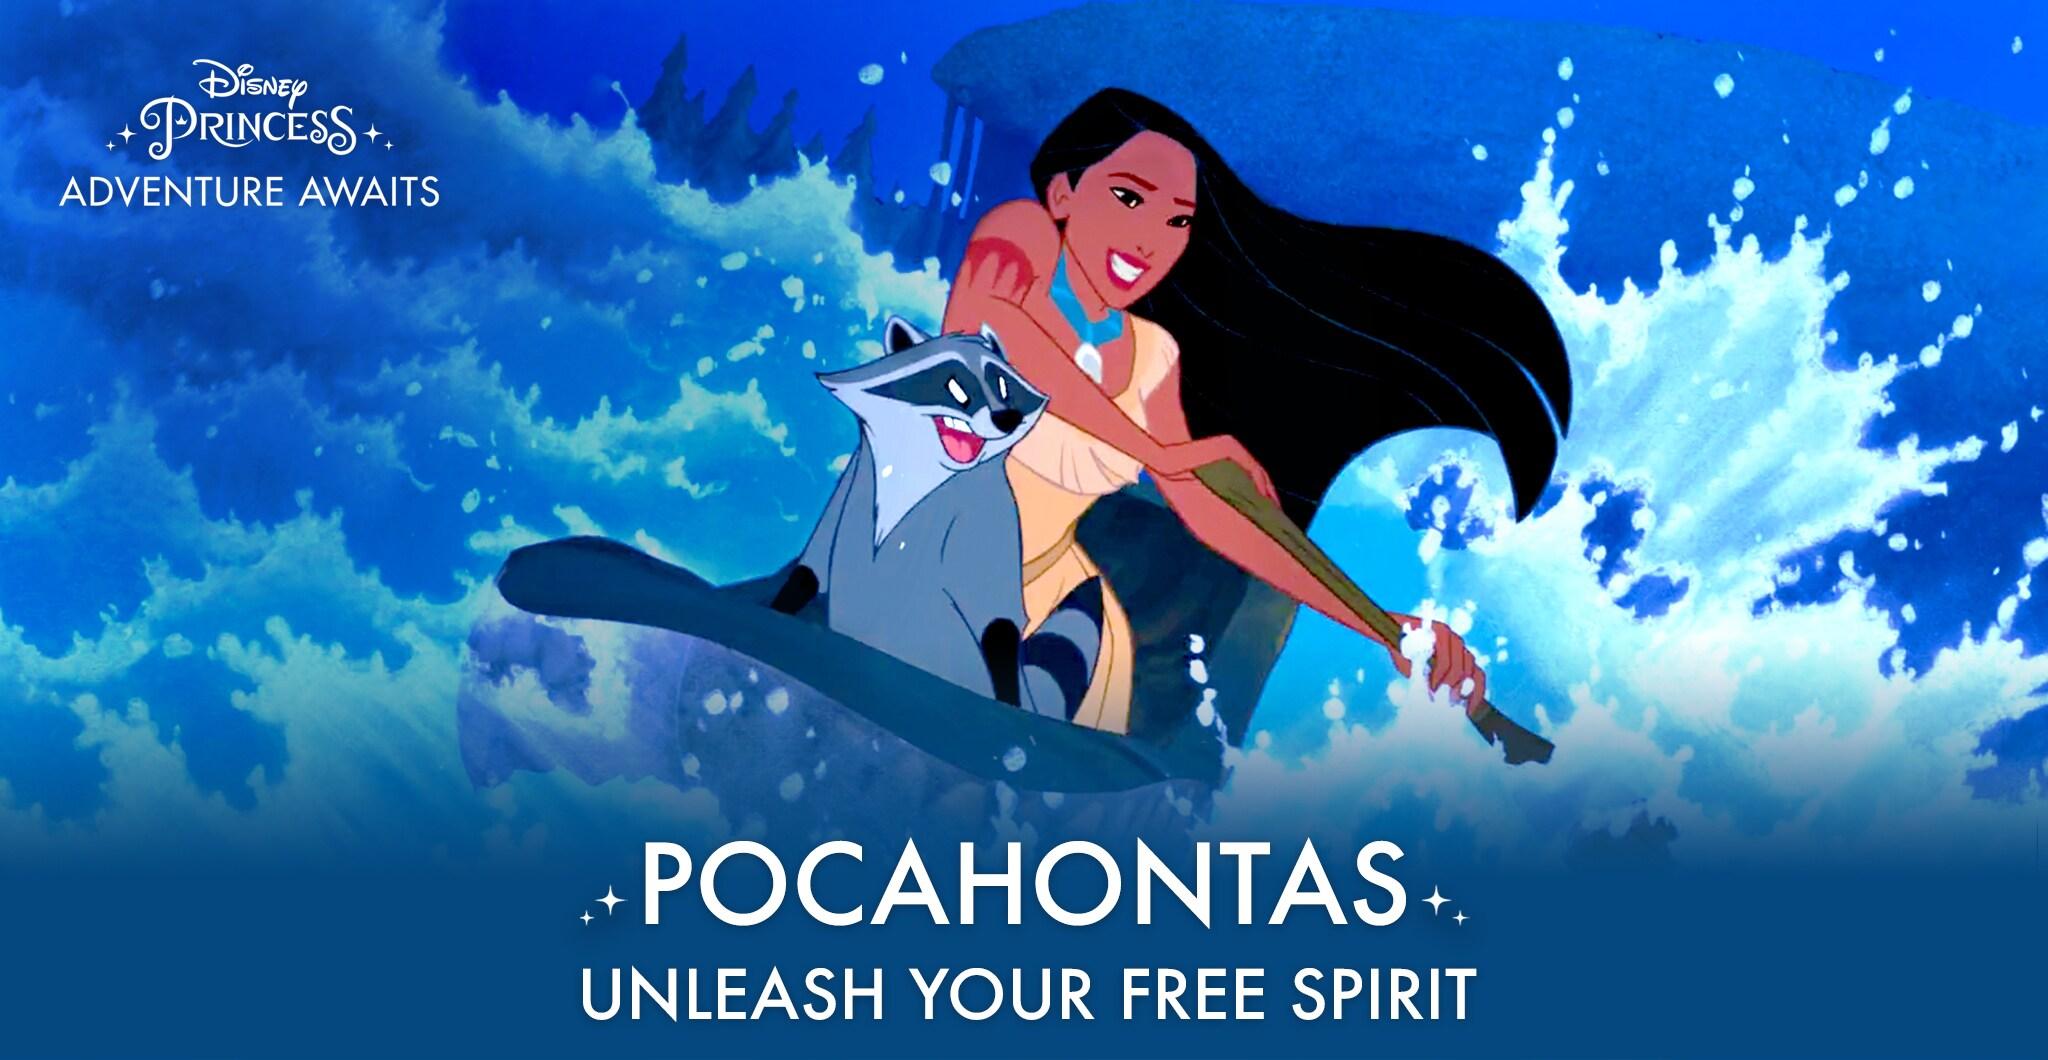 Pocahontas - Unleash Your Free Spirit